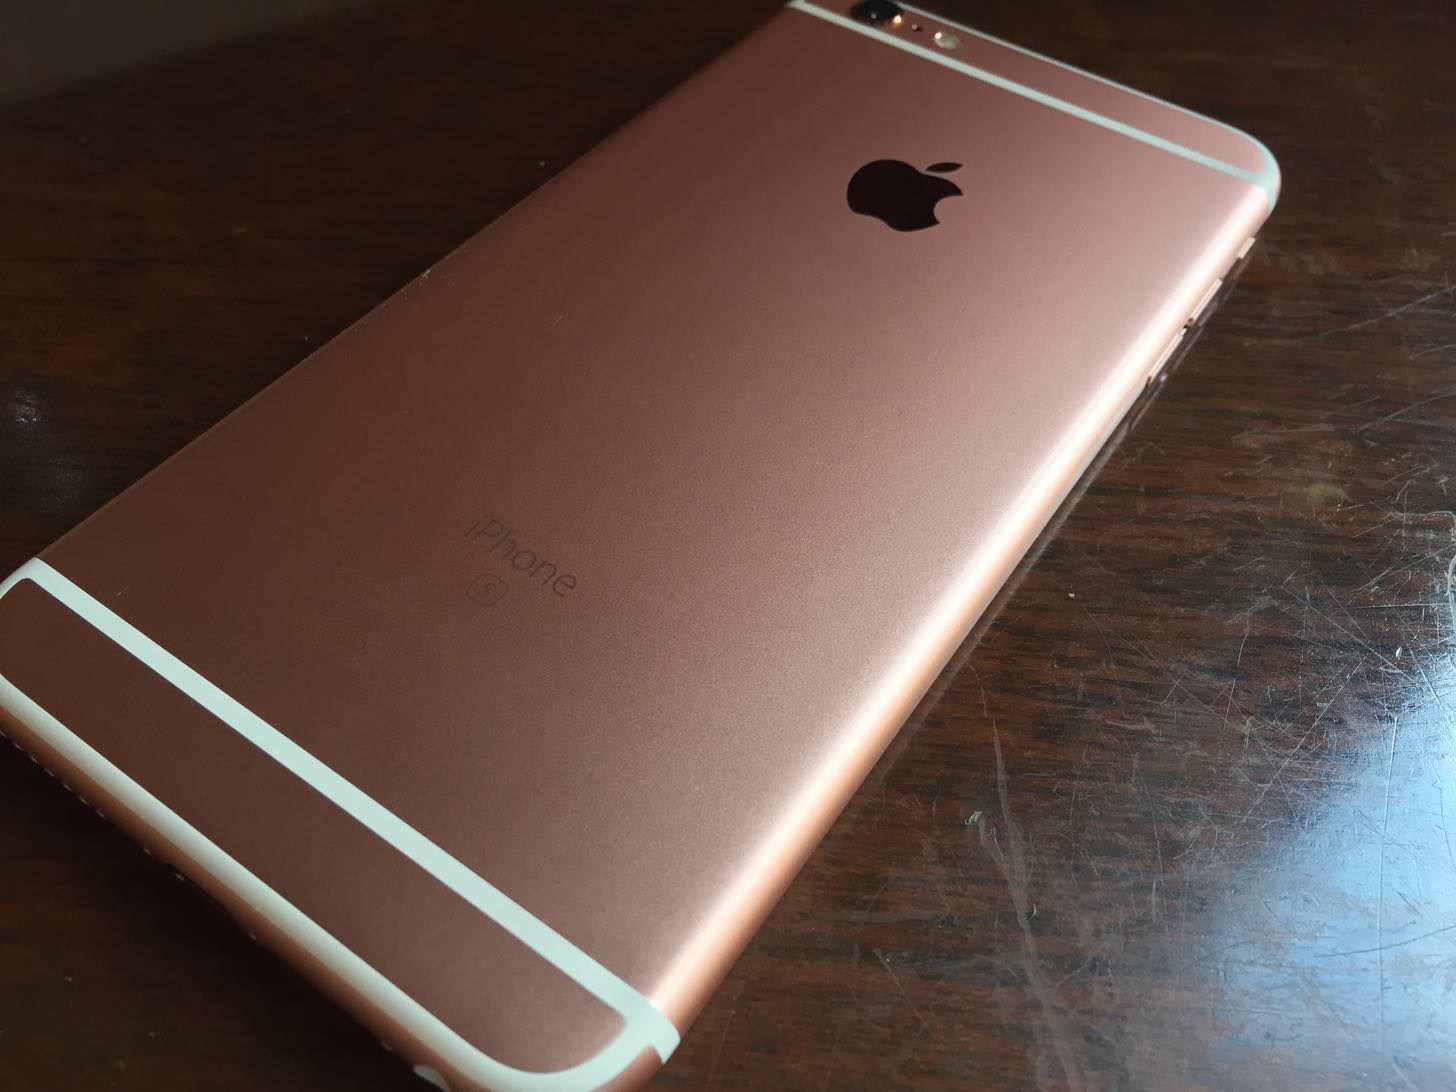 iPhone 6s Plus ローズゴールド 64GBの右サイド。